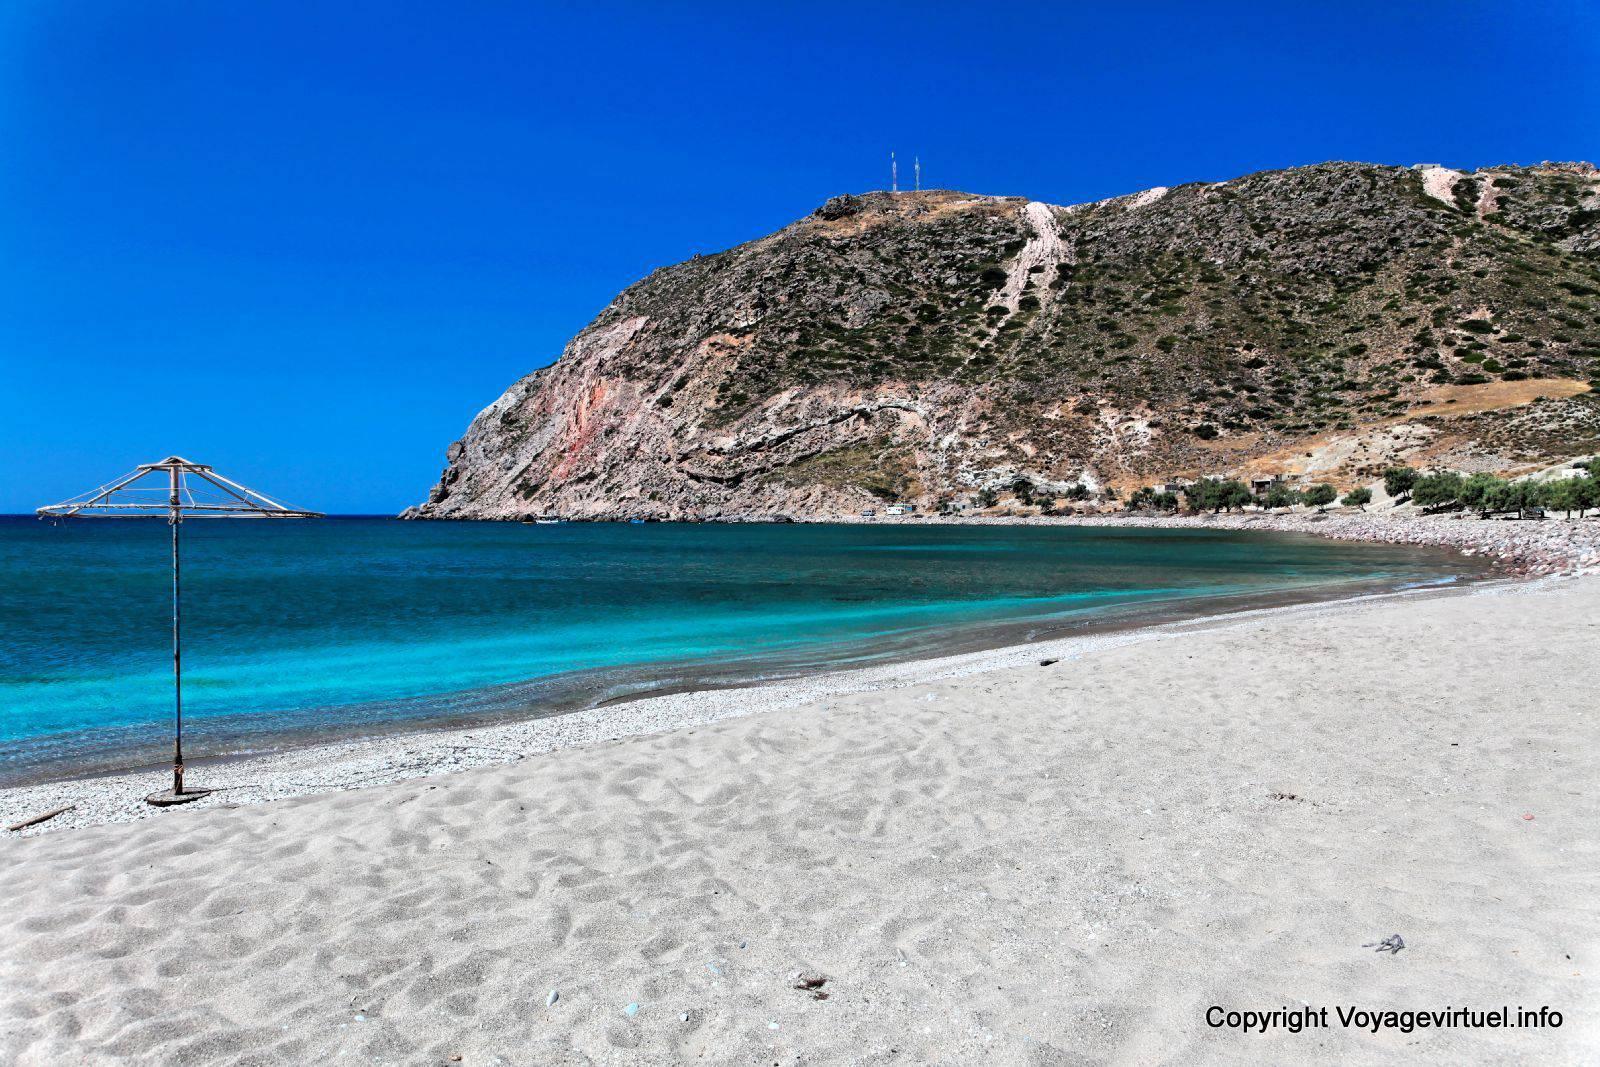 grece plage sable blanc